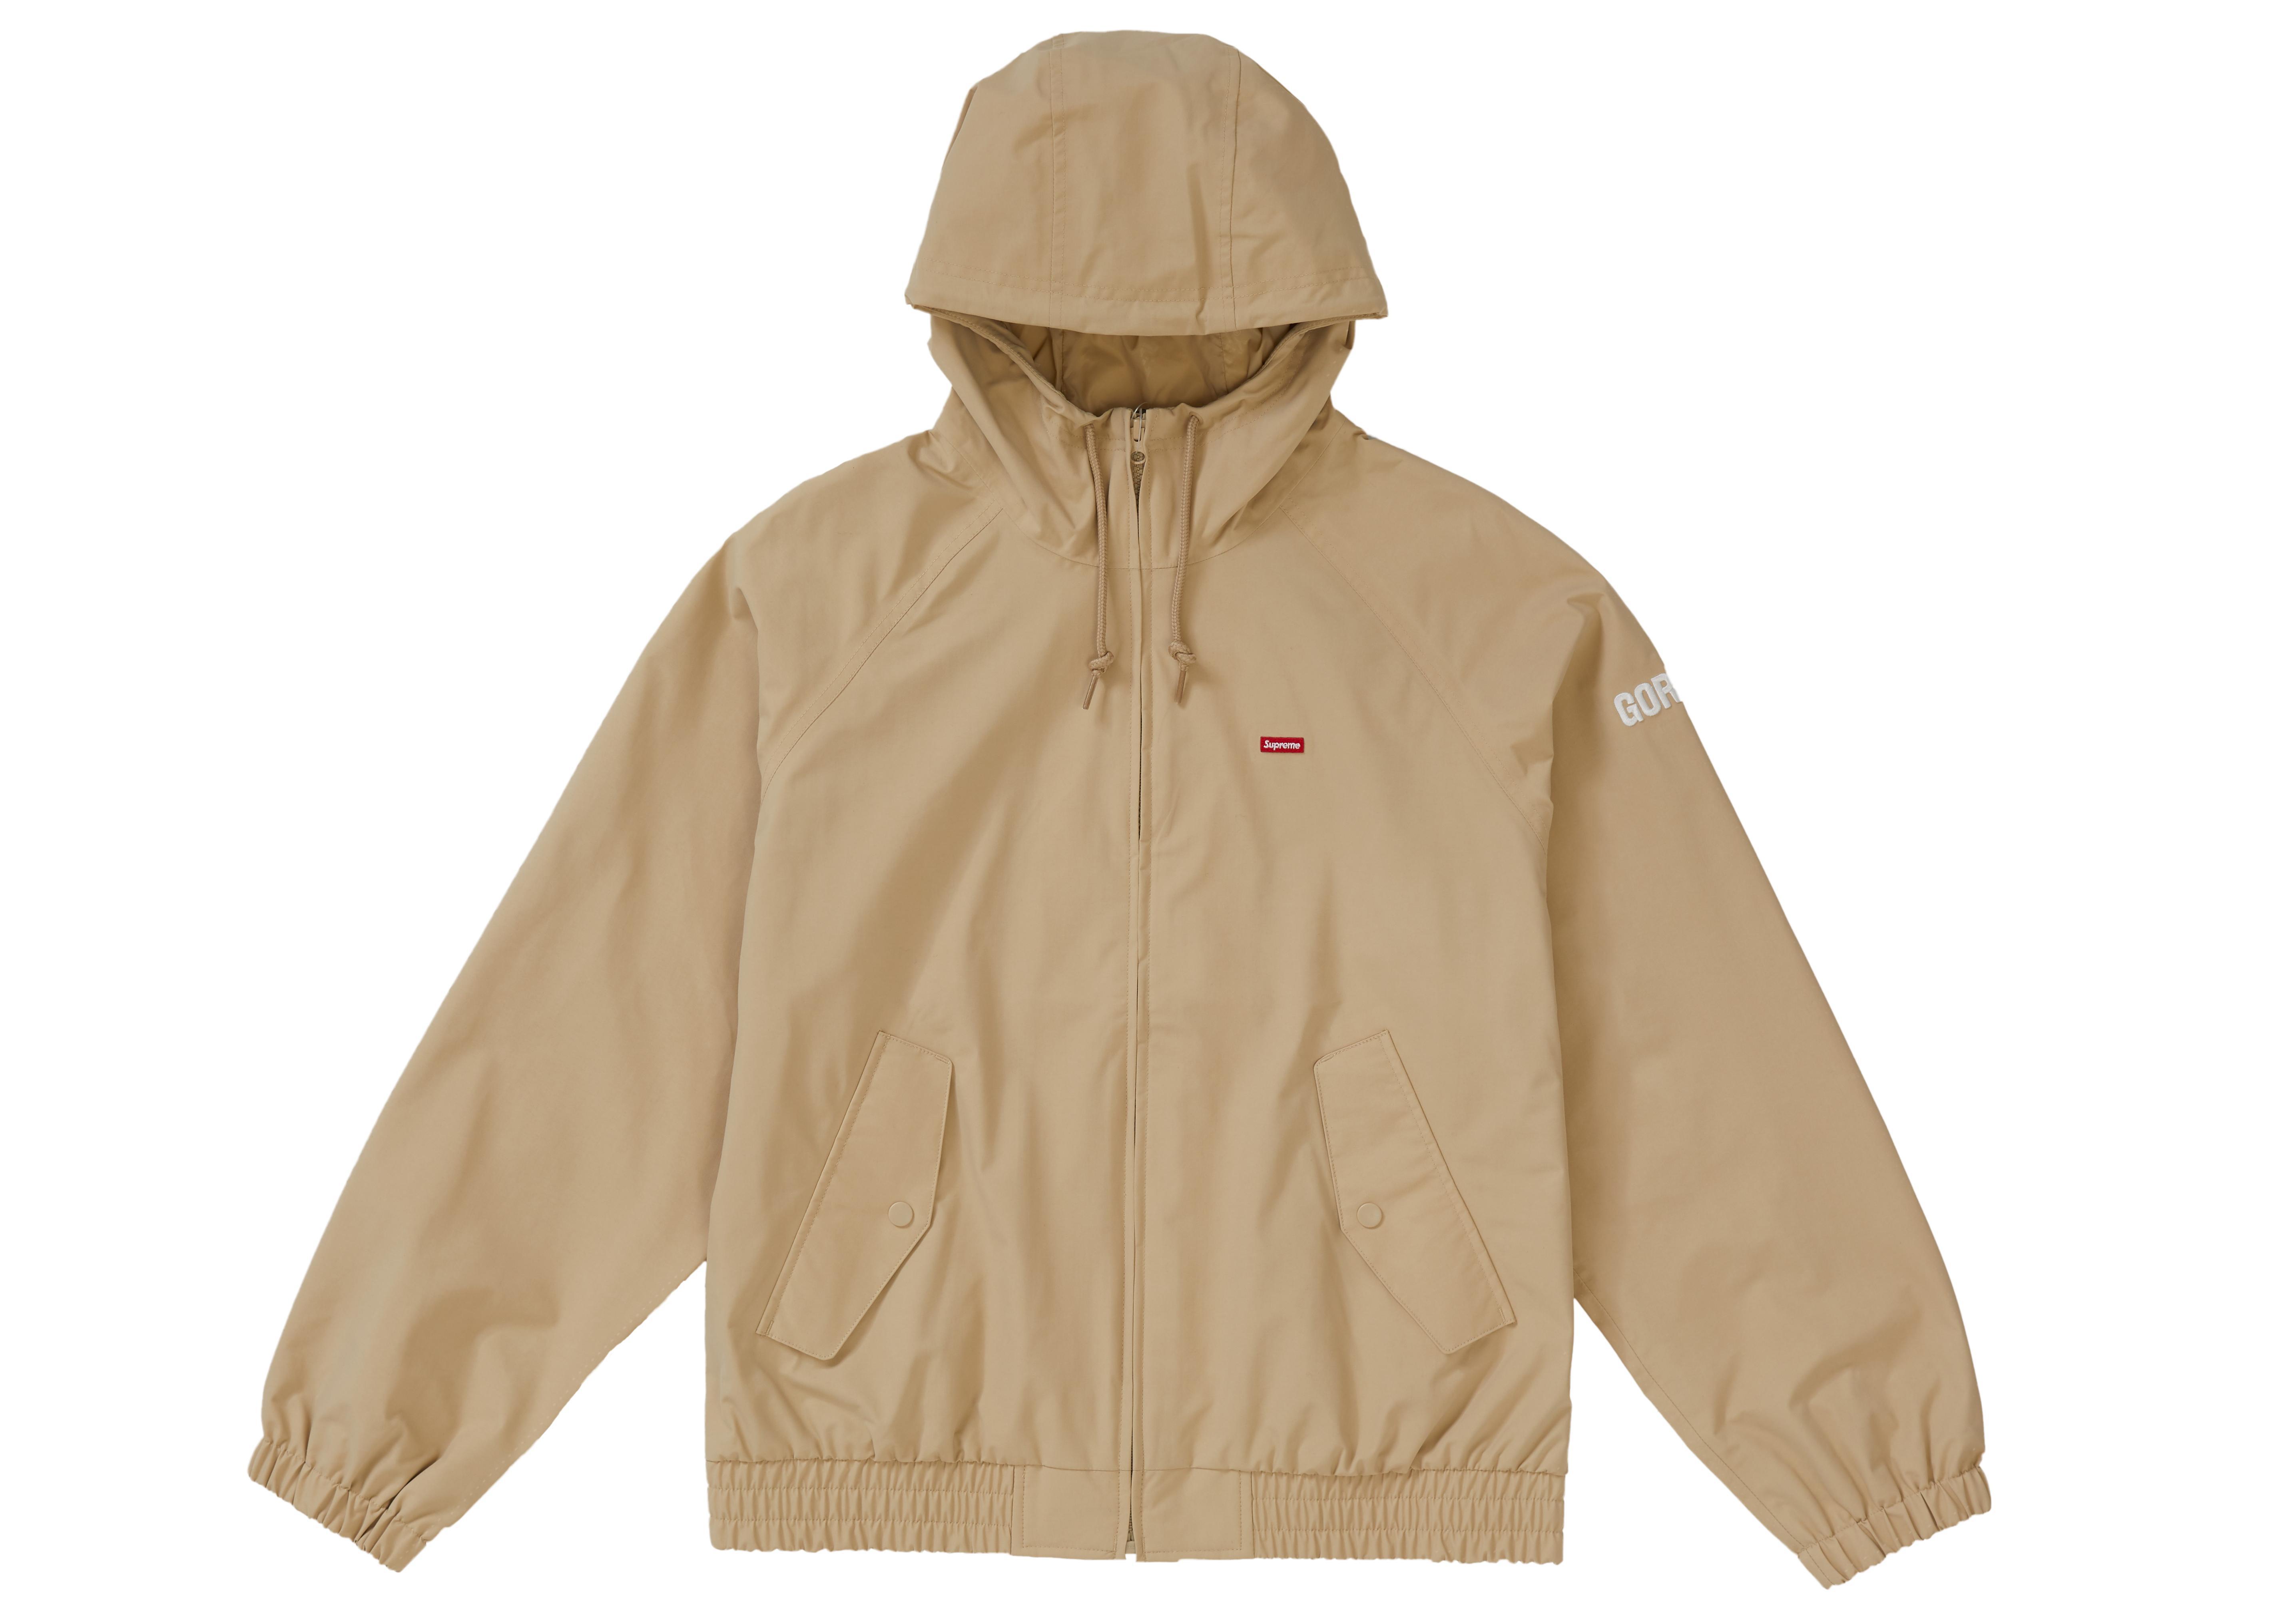 81e42d21 Supreme - Brown Gore-tex Hooded Harrington Jacket Tan for Men - Lyst. View  fullscreen